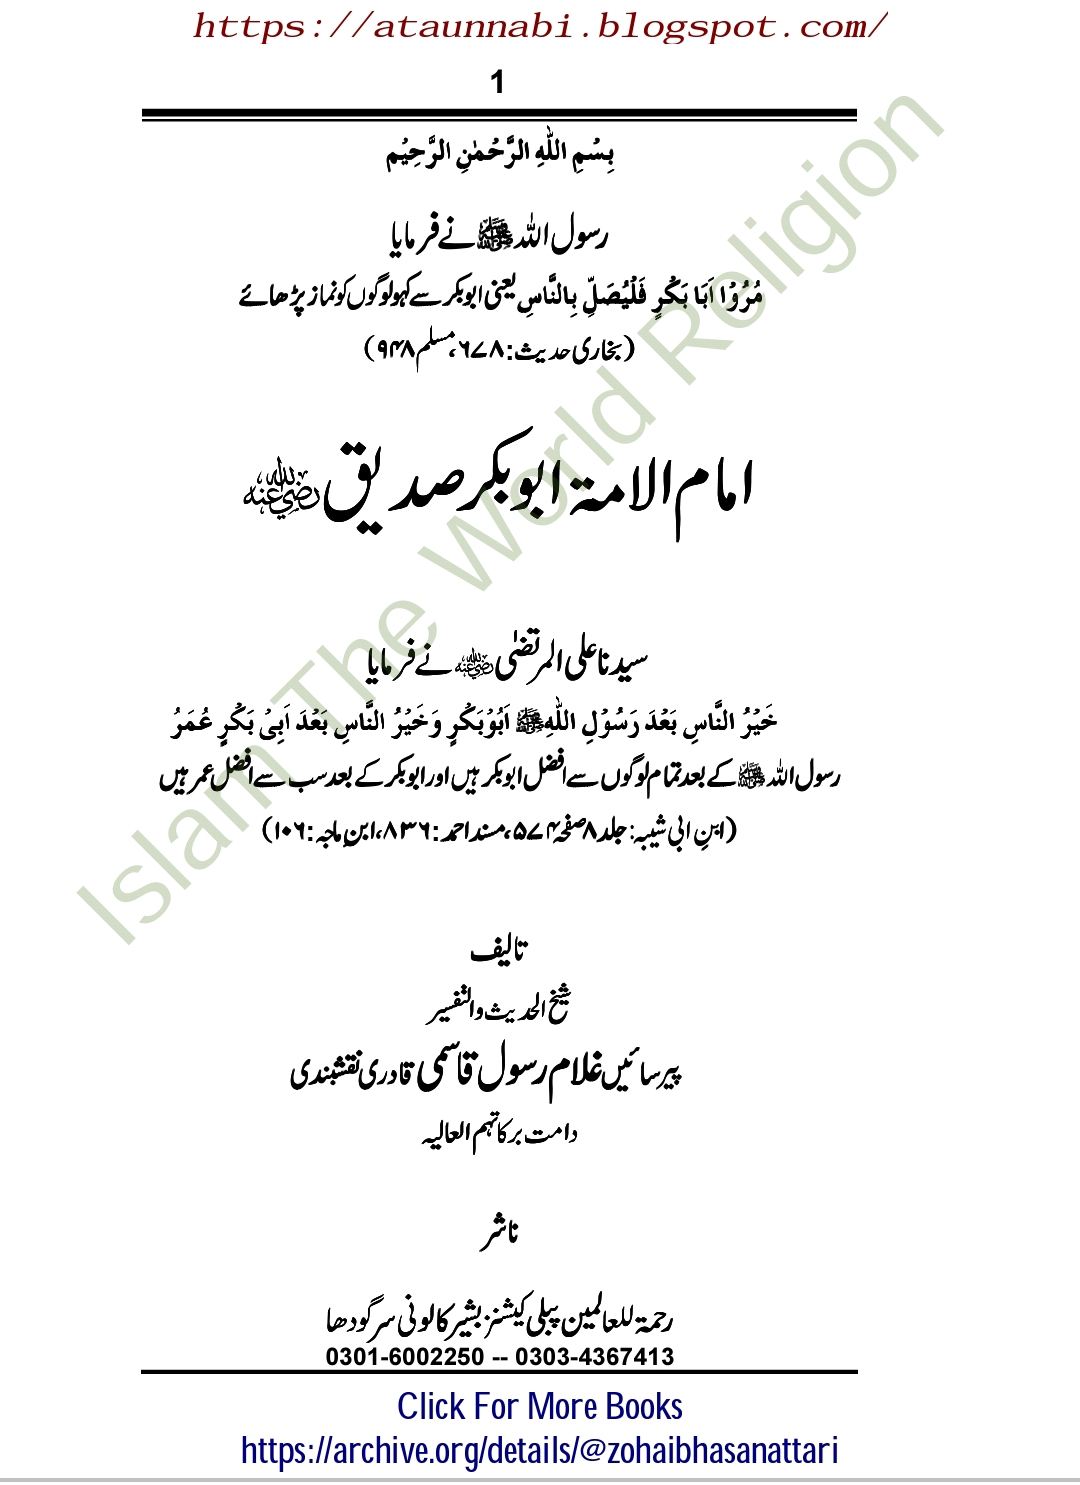 Imam Ul Ummat Abubakar Siddiqe / امام الامتہ ابوبکر صدیق رضی